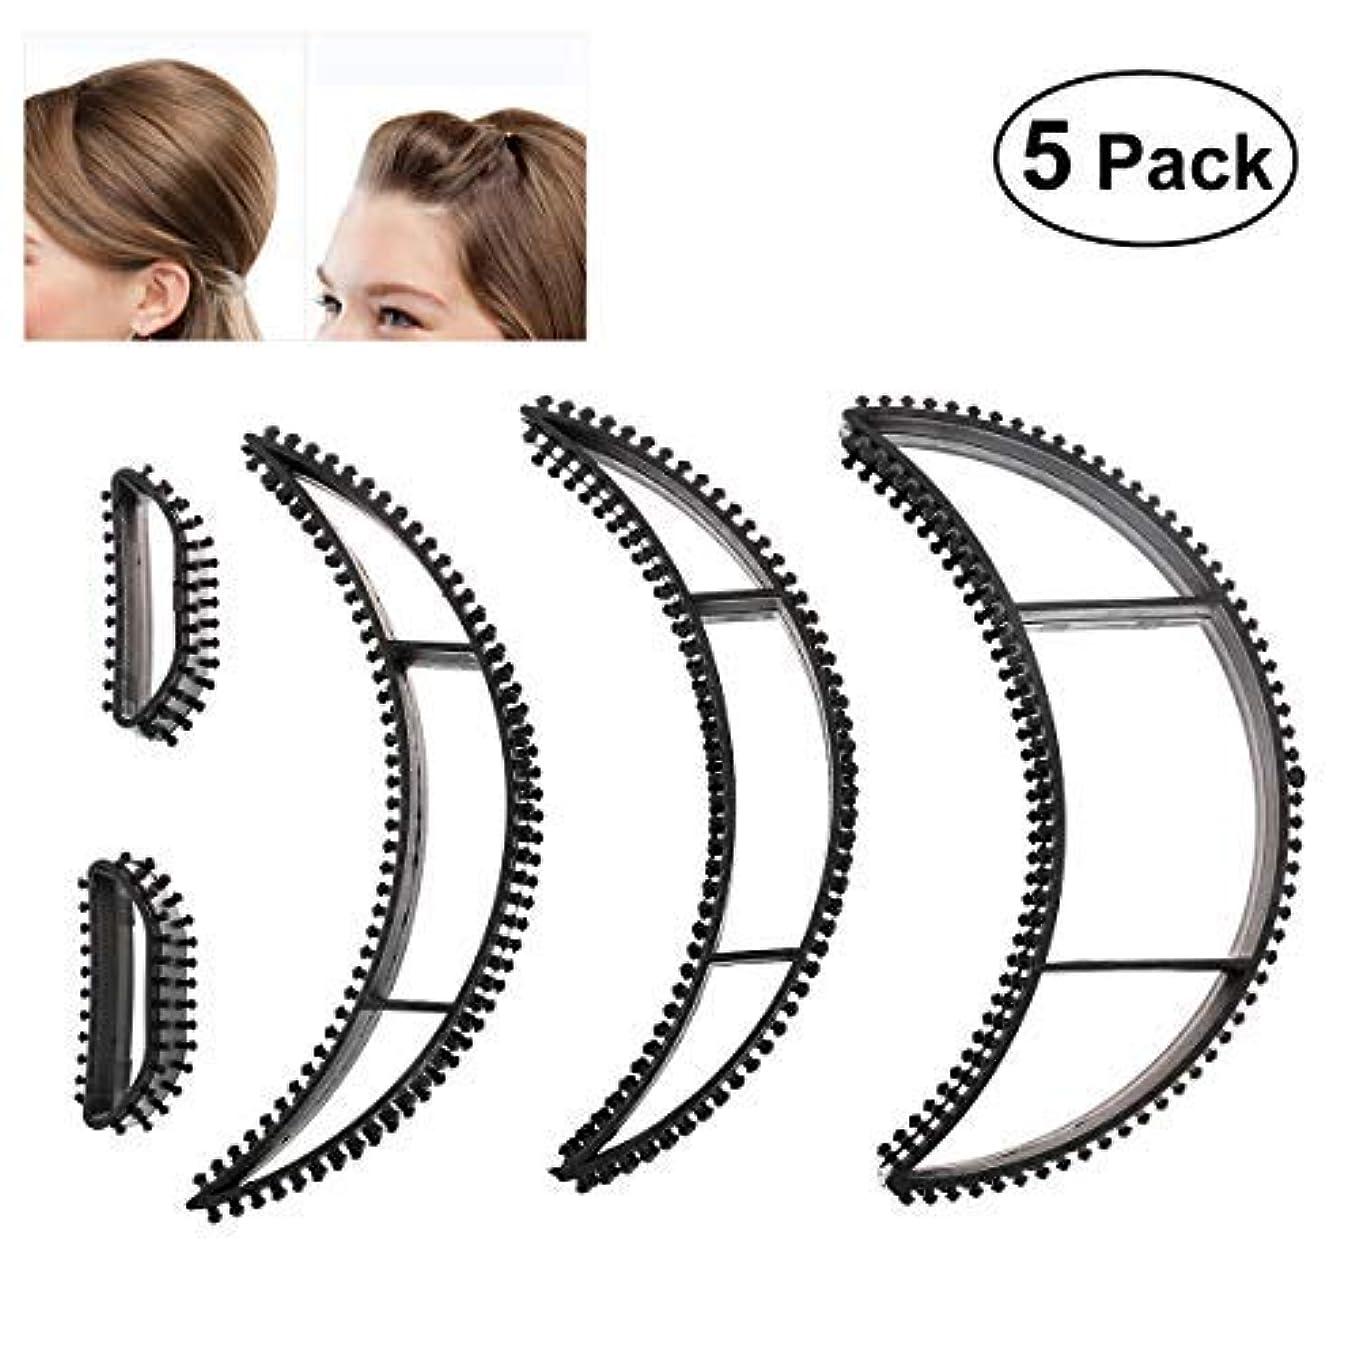 Tinksky Big Bumpits Happie Hair Volumizing Inserts Hair Pump Beauty Set Tool Gift,Pack of 5 (Black) [並行輸入品]